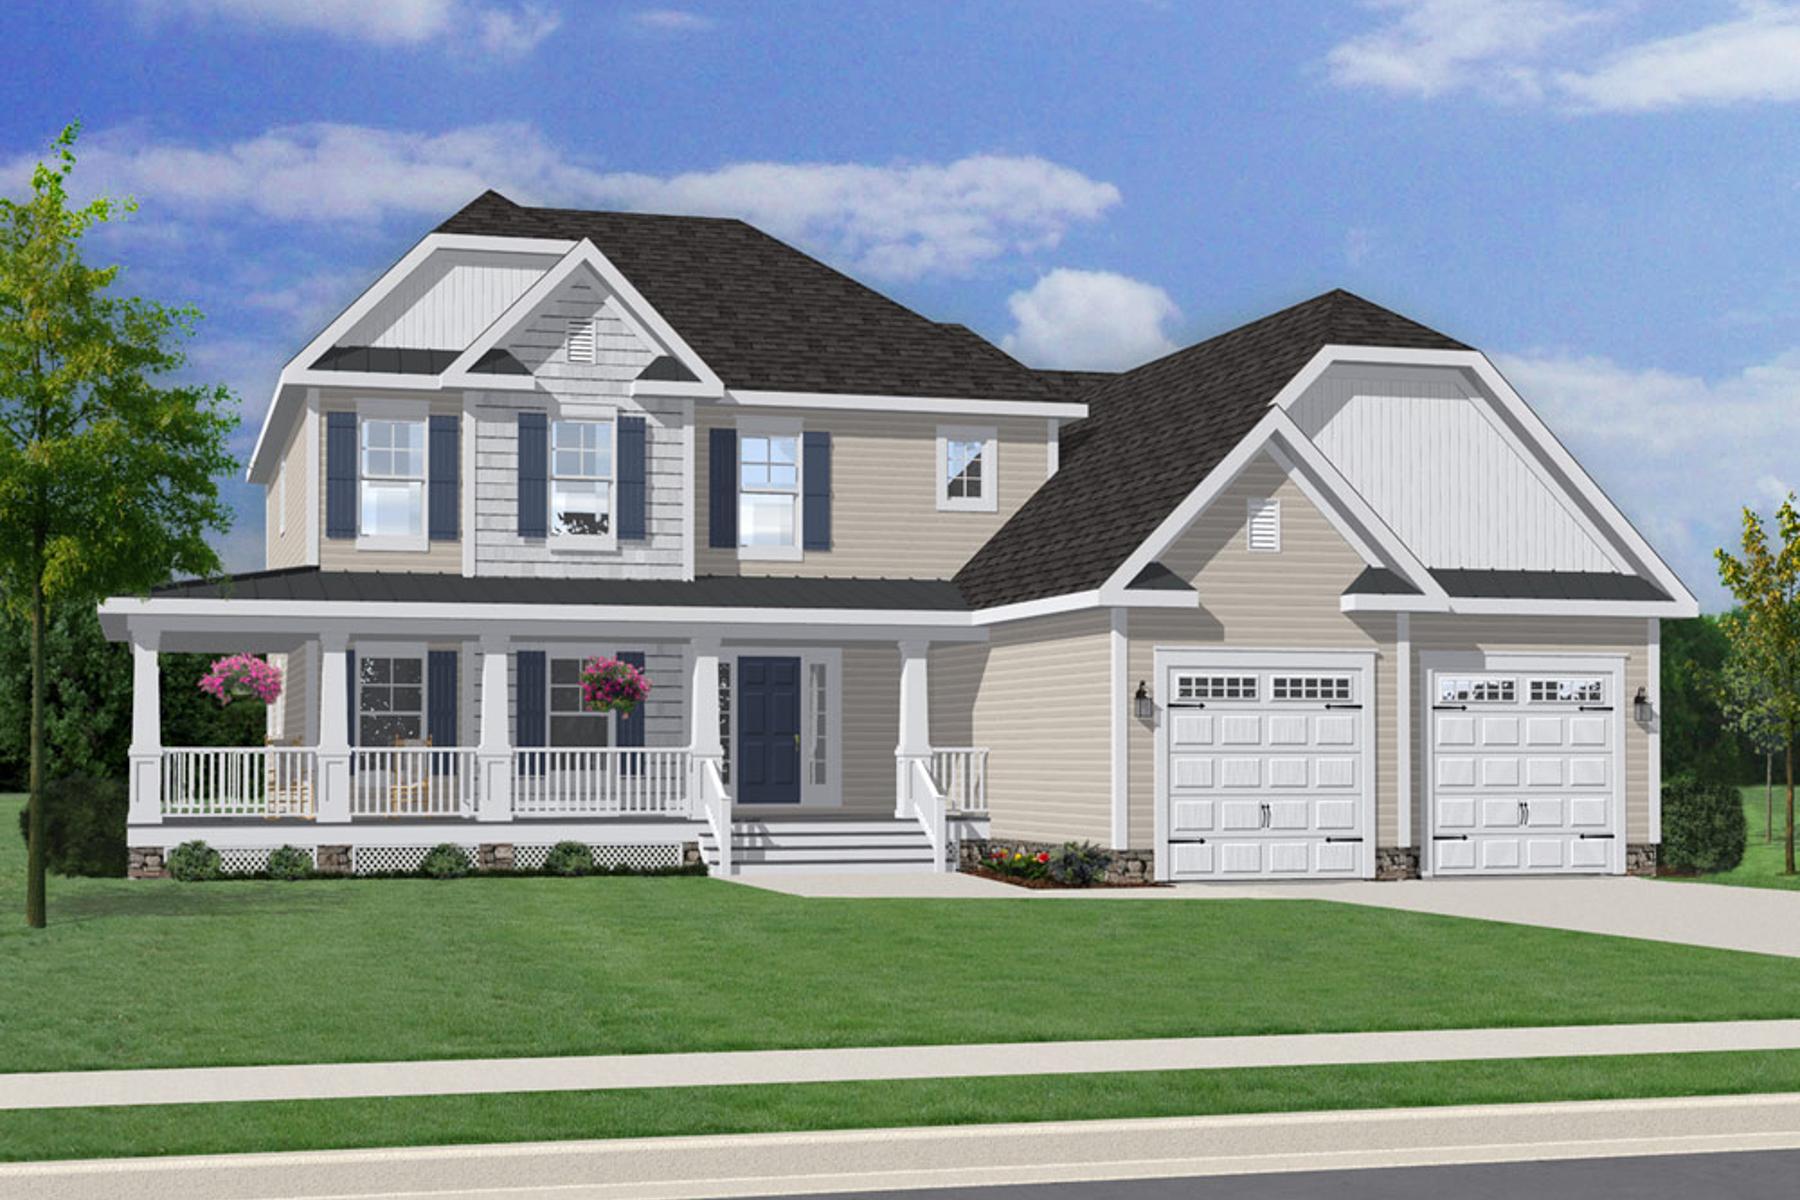 Single Family Home for Sale at 33434 Marina Bay Cir, Millsboro, DE 19966 33434 Marina Bay Cir (beach Plum Sfh) Millsboro, 19966 United States